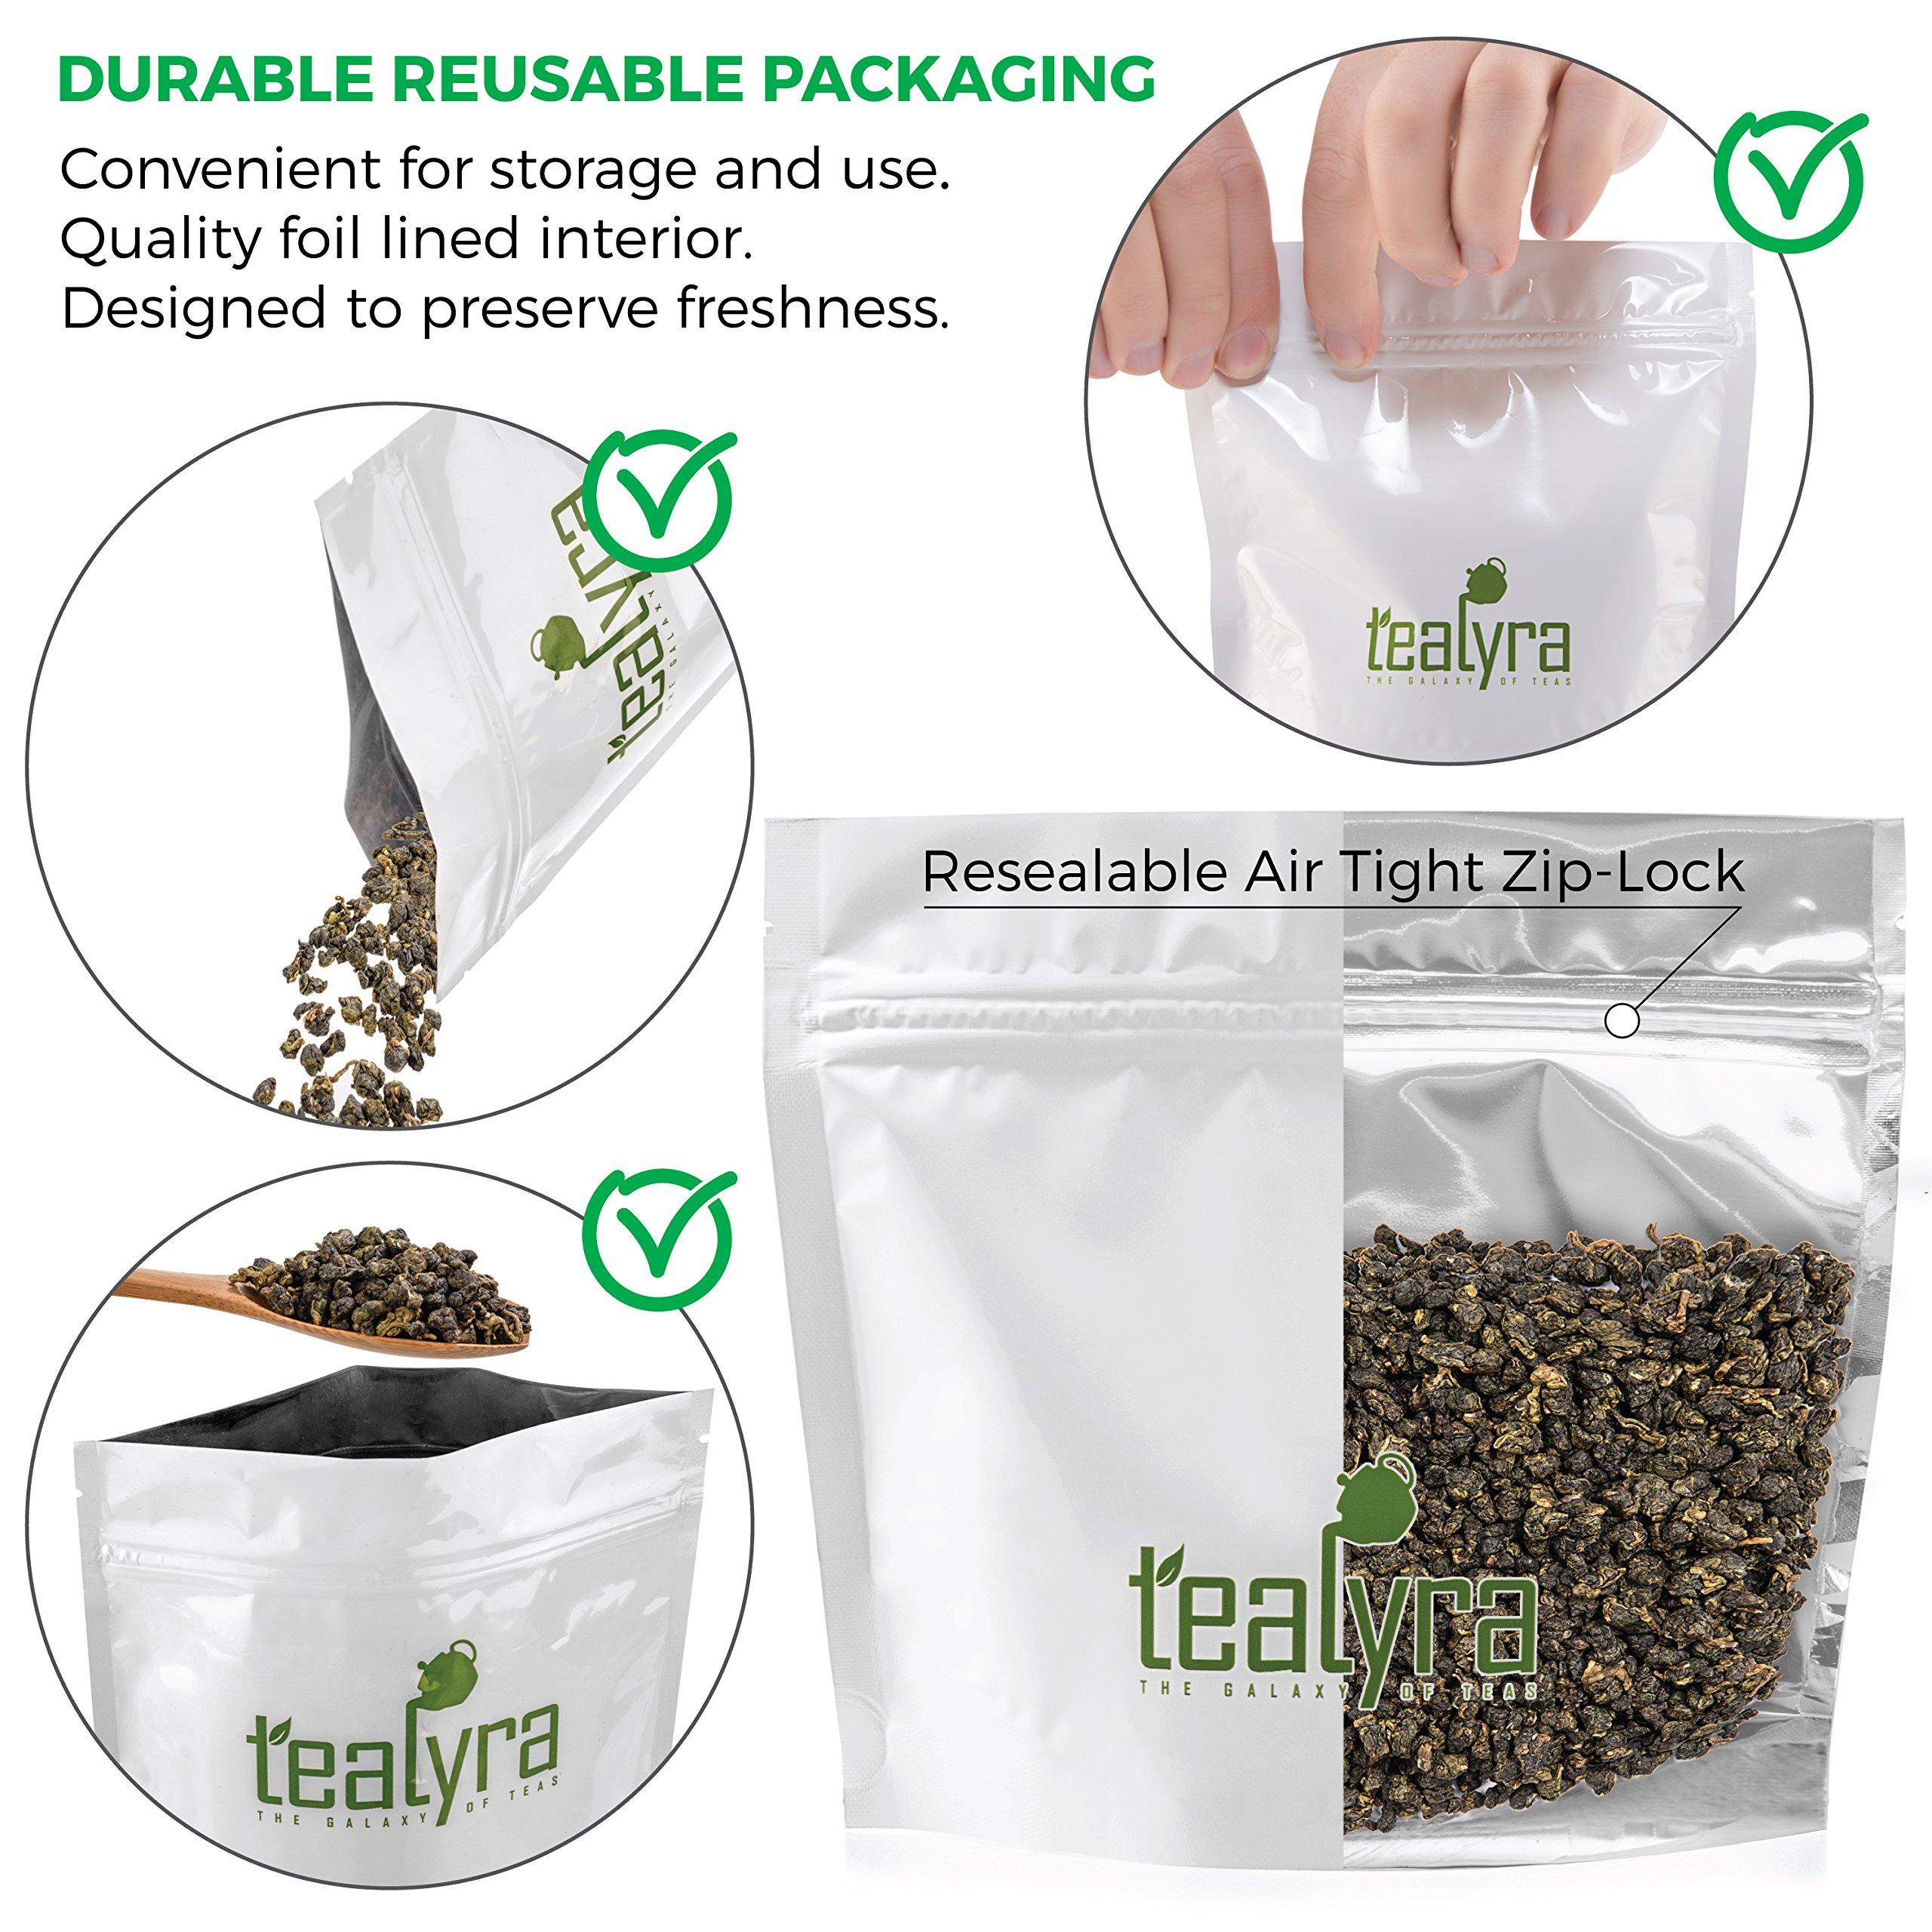 Tealyra - Milk Jin Xuan Oolong - High Mountain Taiwanese Loose Leaf Tea - Great Milky Cream Taste and Aroma - Organically Grown - Weight Loss Tea - 200g (7-ounce) by Tealyra (Image #2)